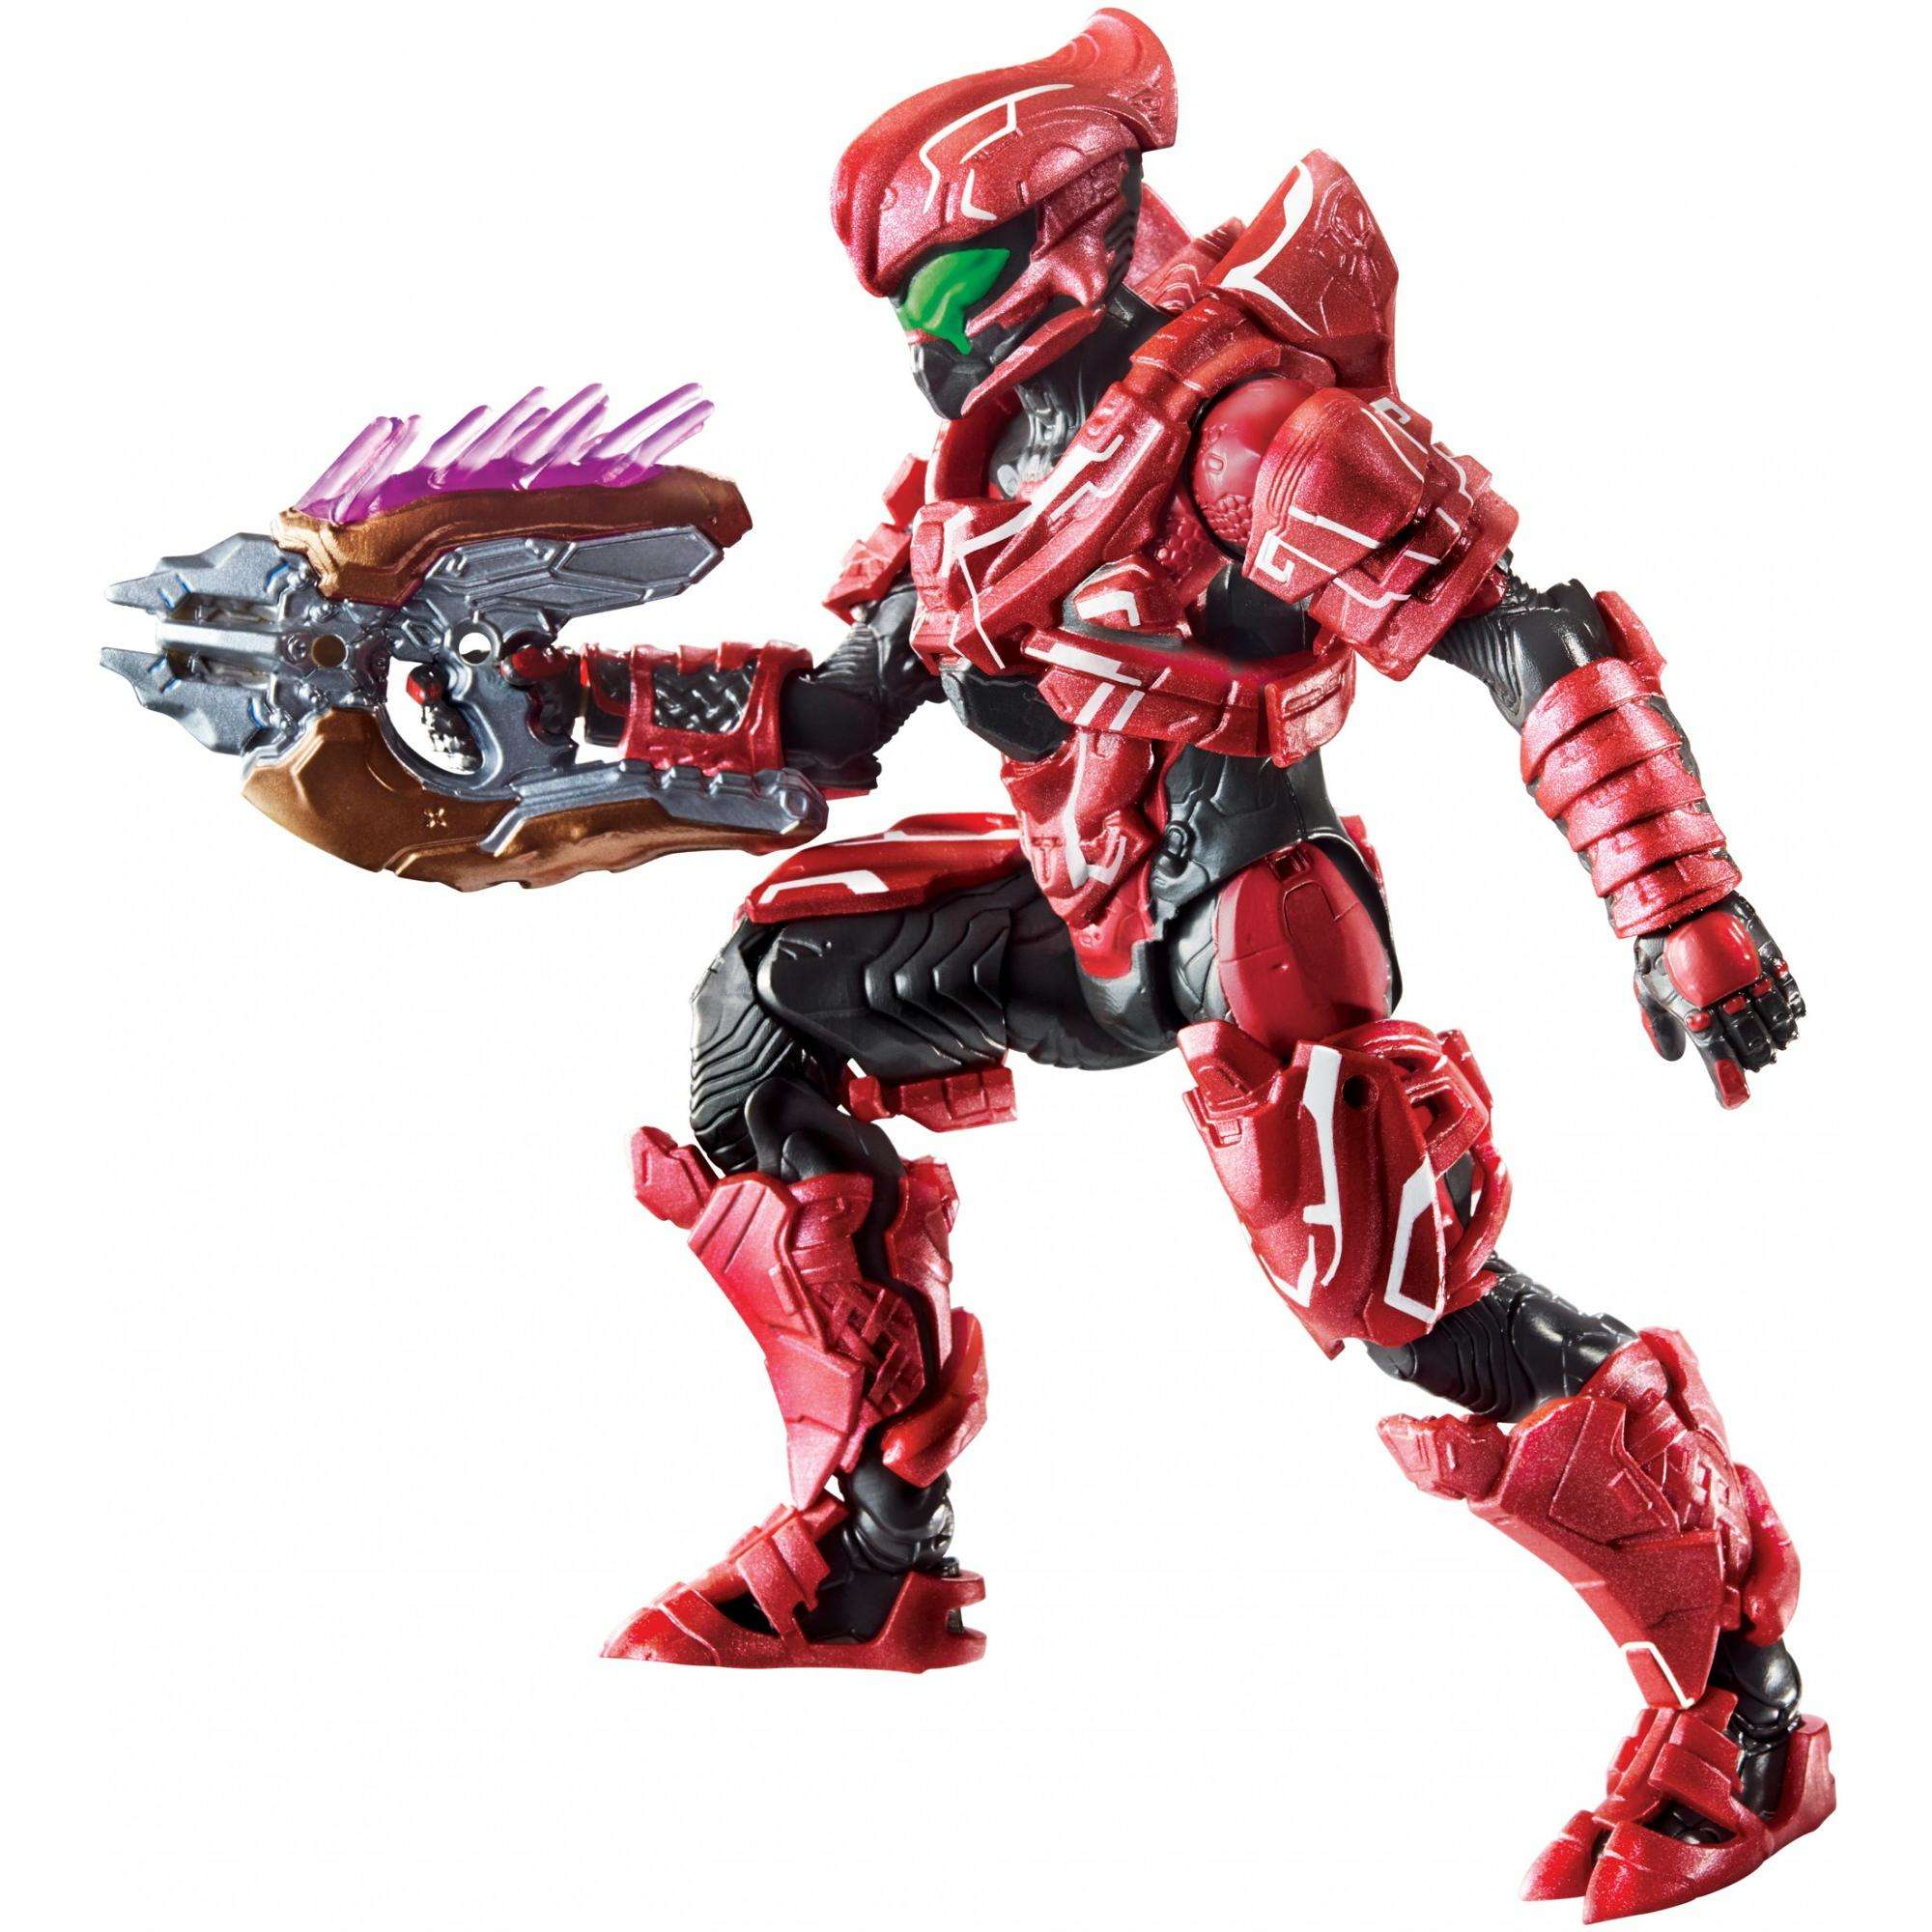 "Halo 6"" Spartan Helioskrill Figure"